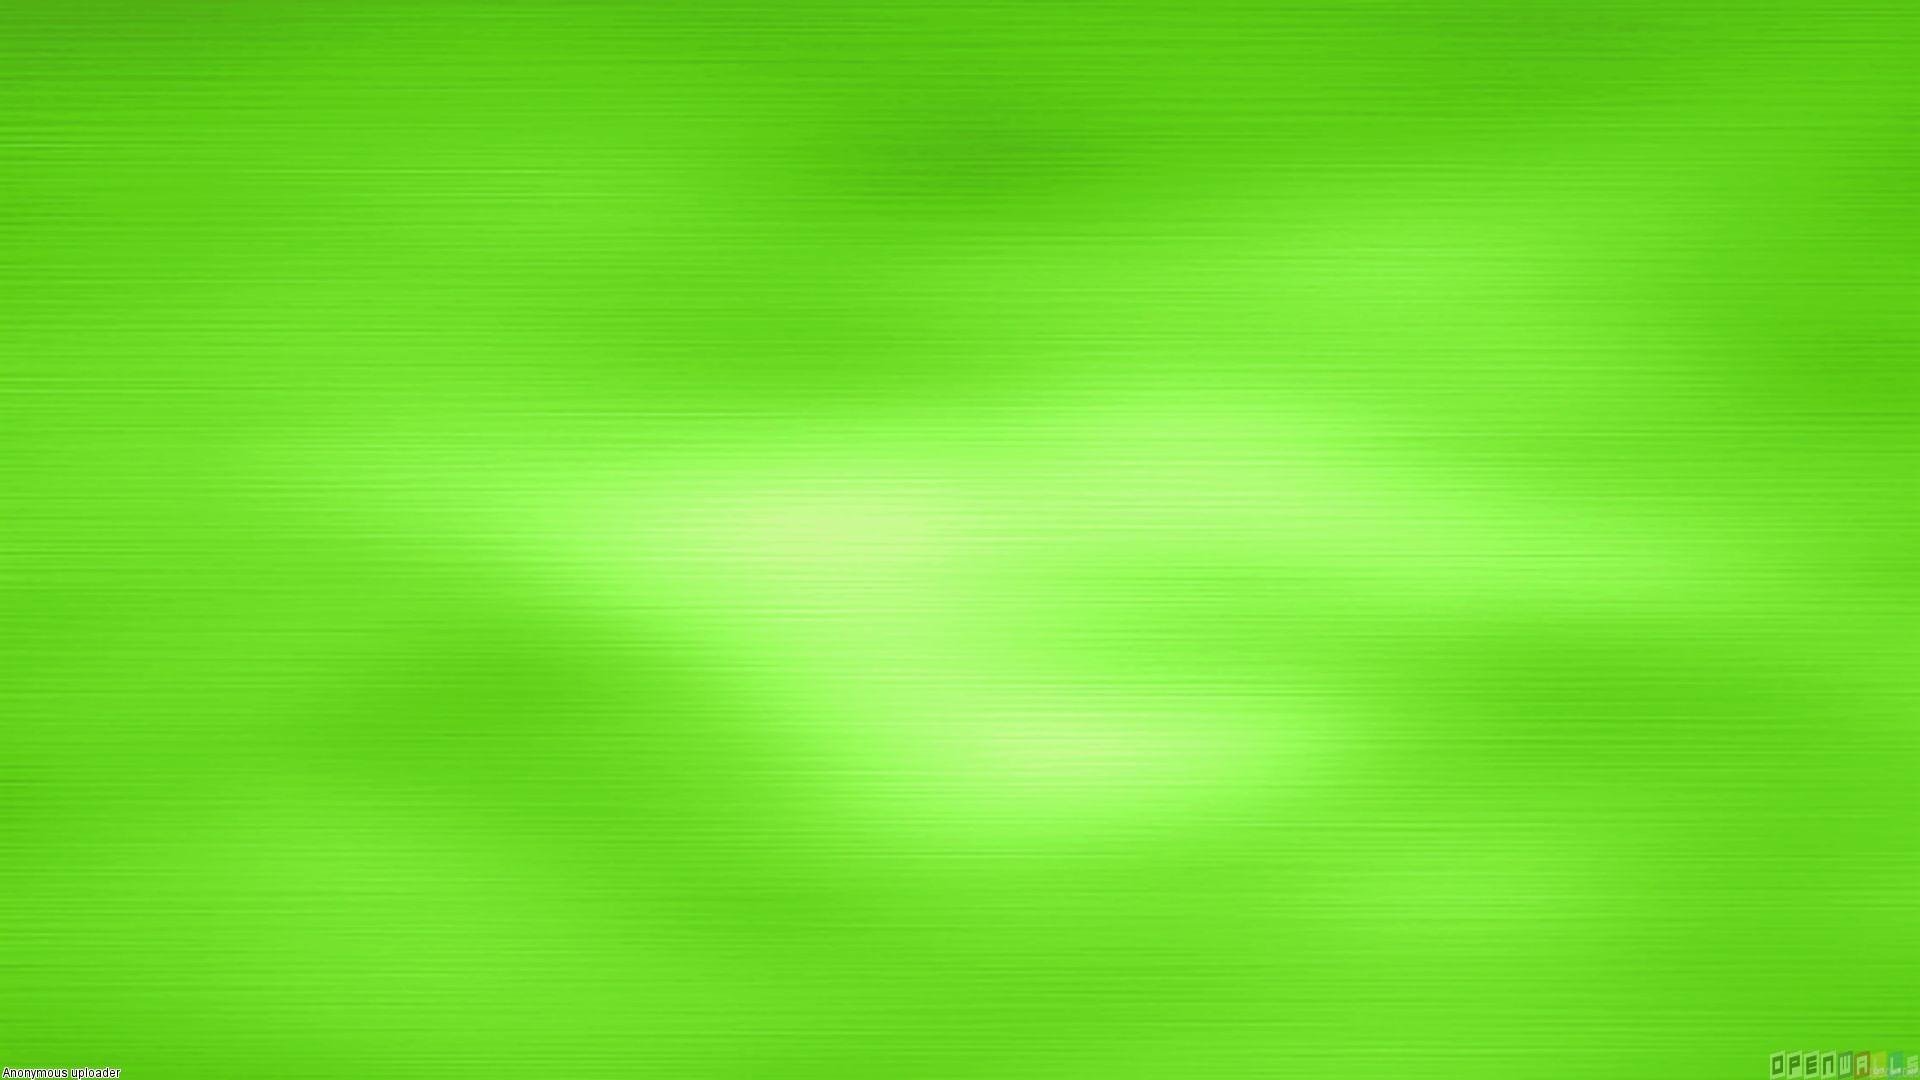 Green Background 2383020 1920x1080